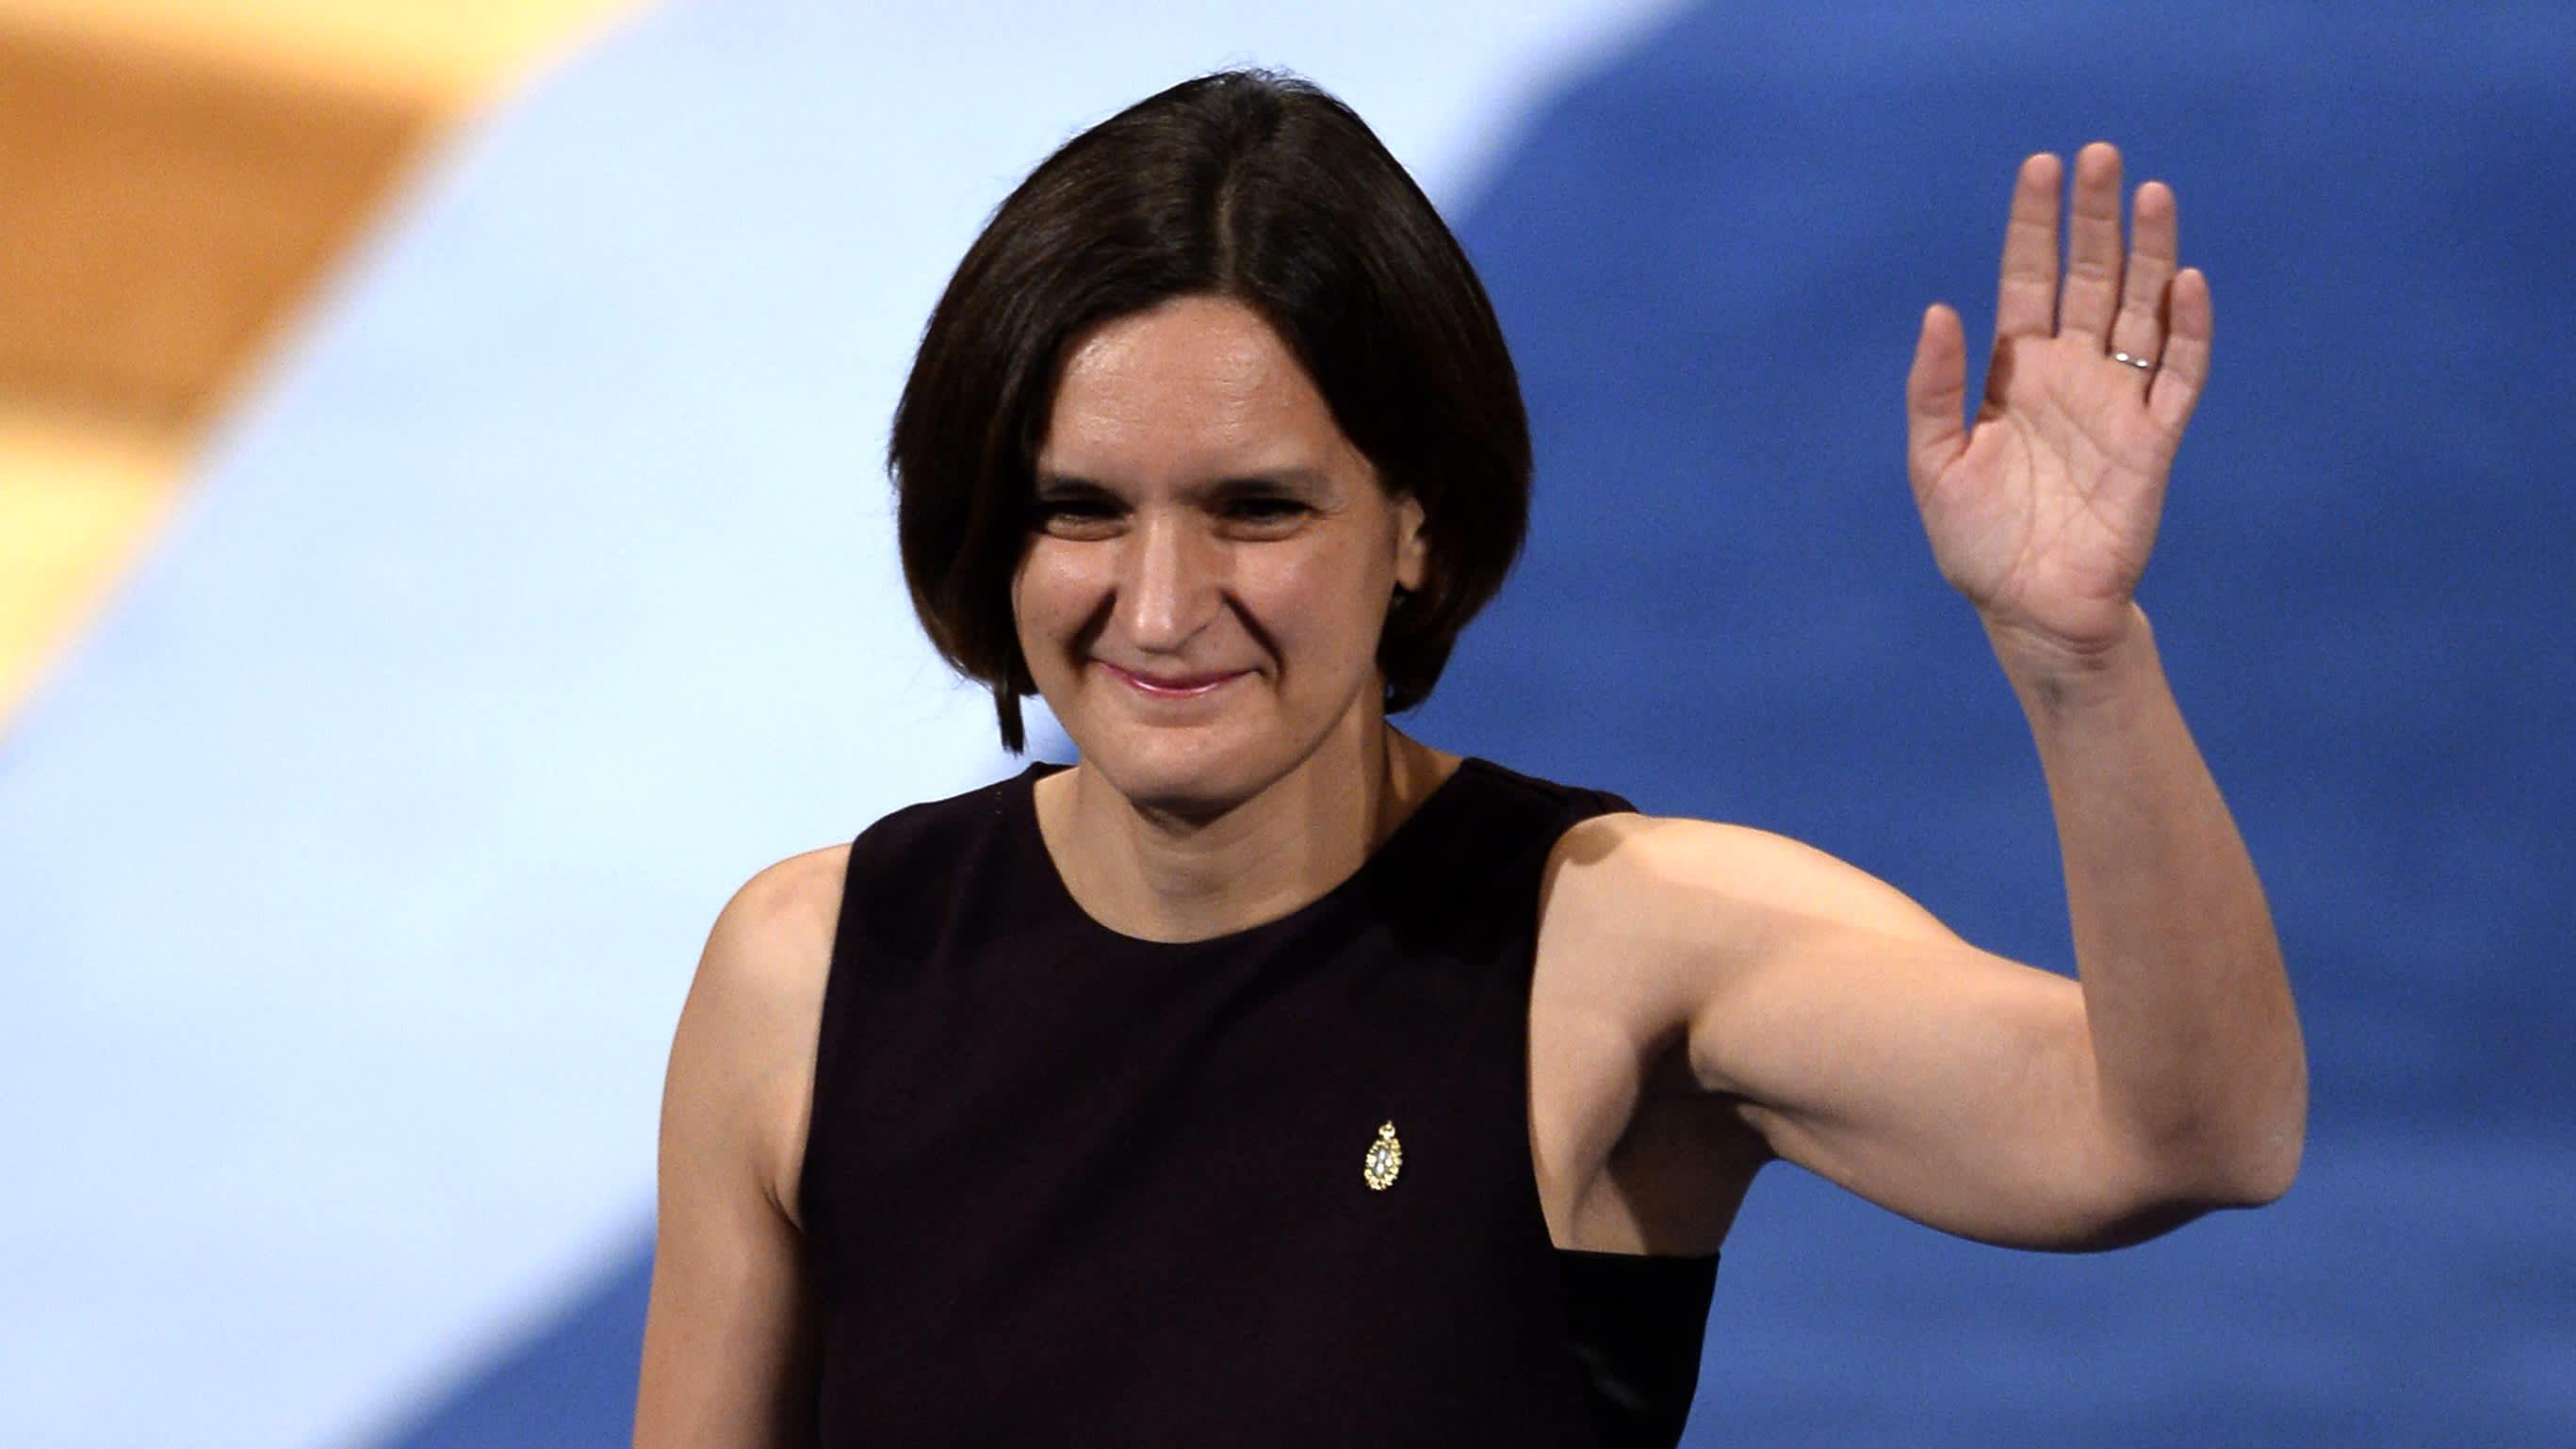 Nobel economics prize winner hopes to inspire 'many, many other women'